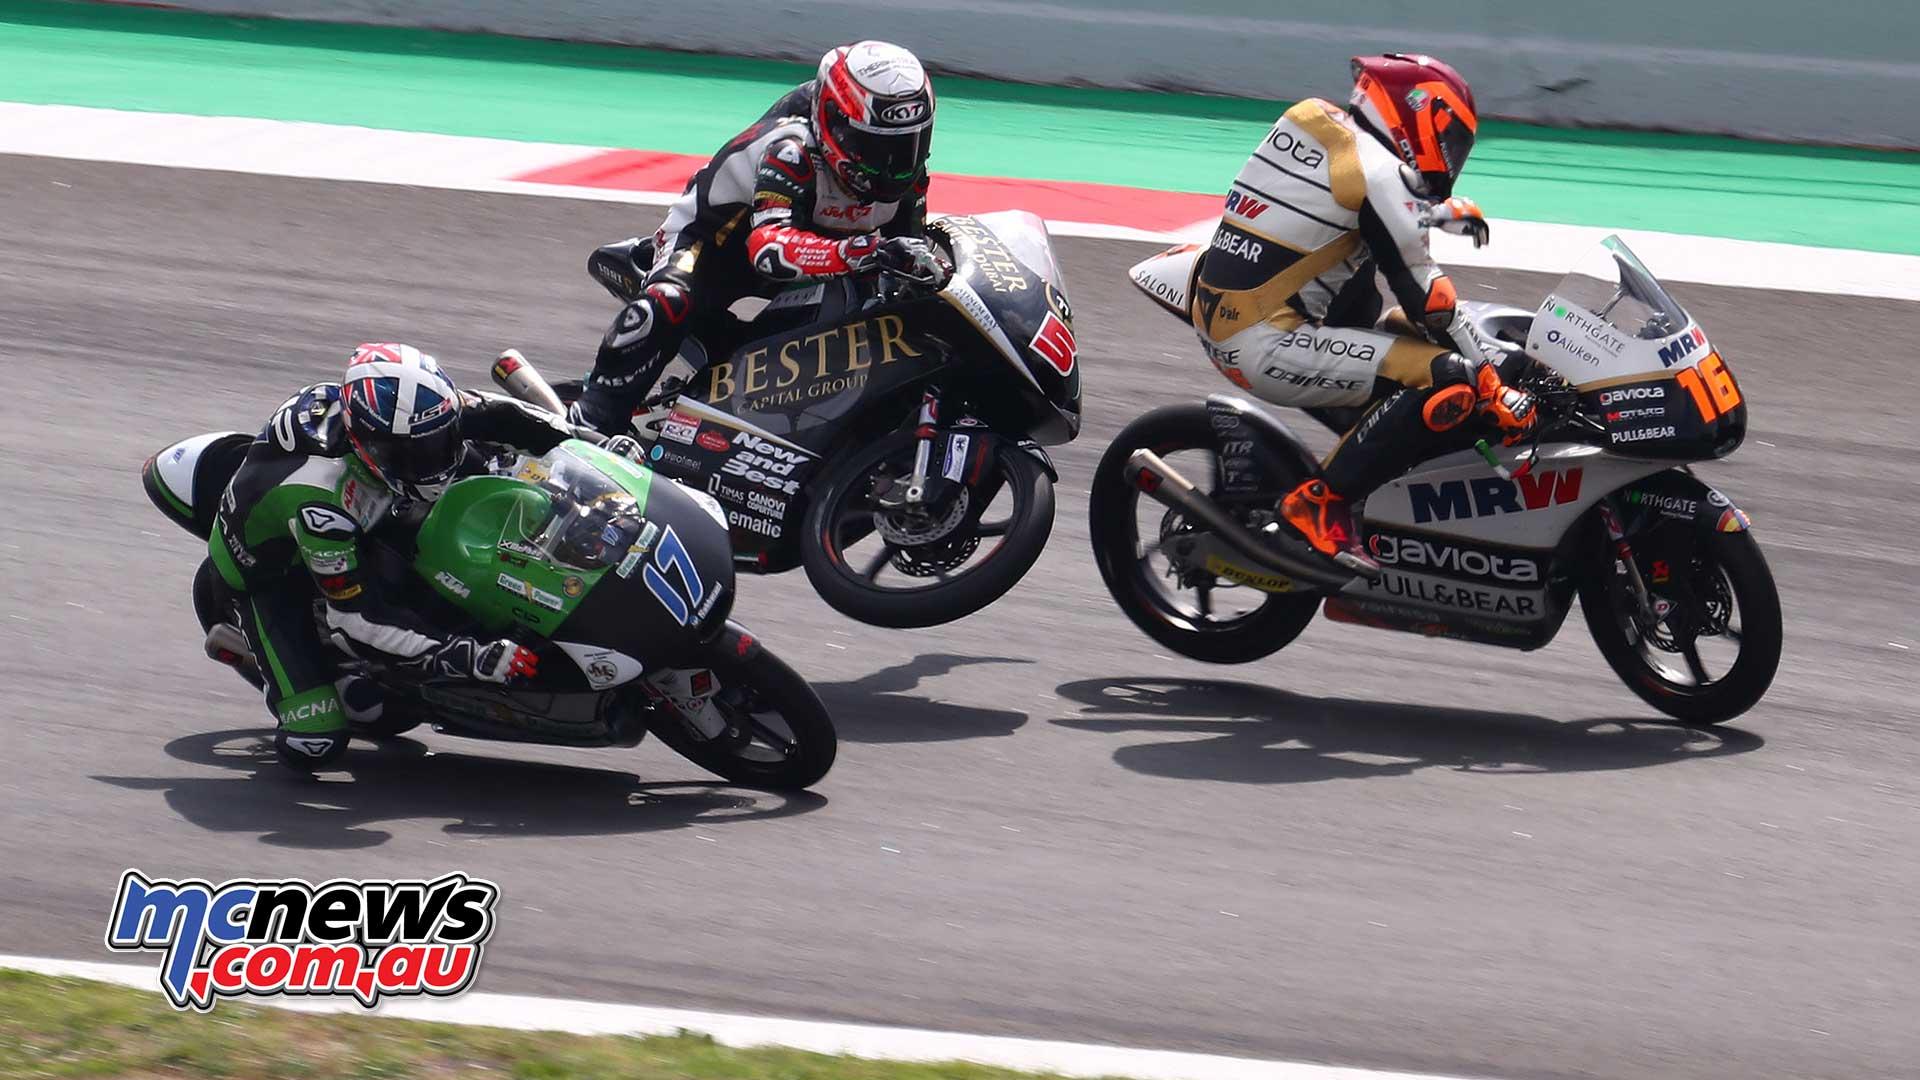 Catalunya Motogp Moto2 Images Moto3 Images Mcnews Com Au